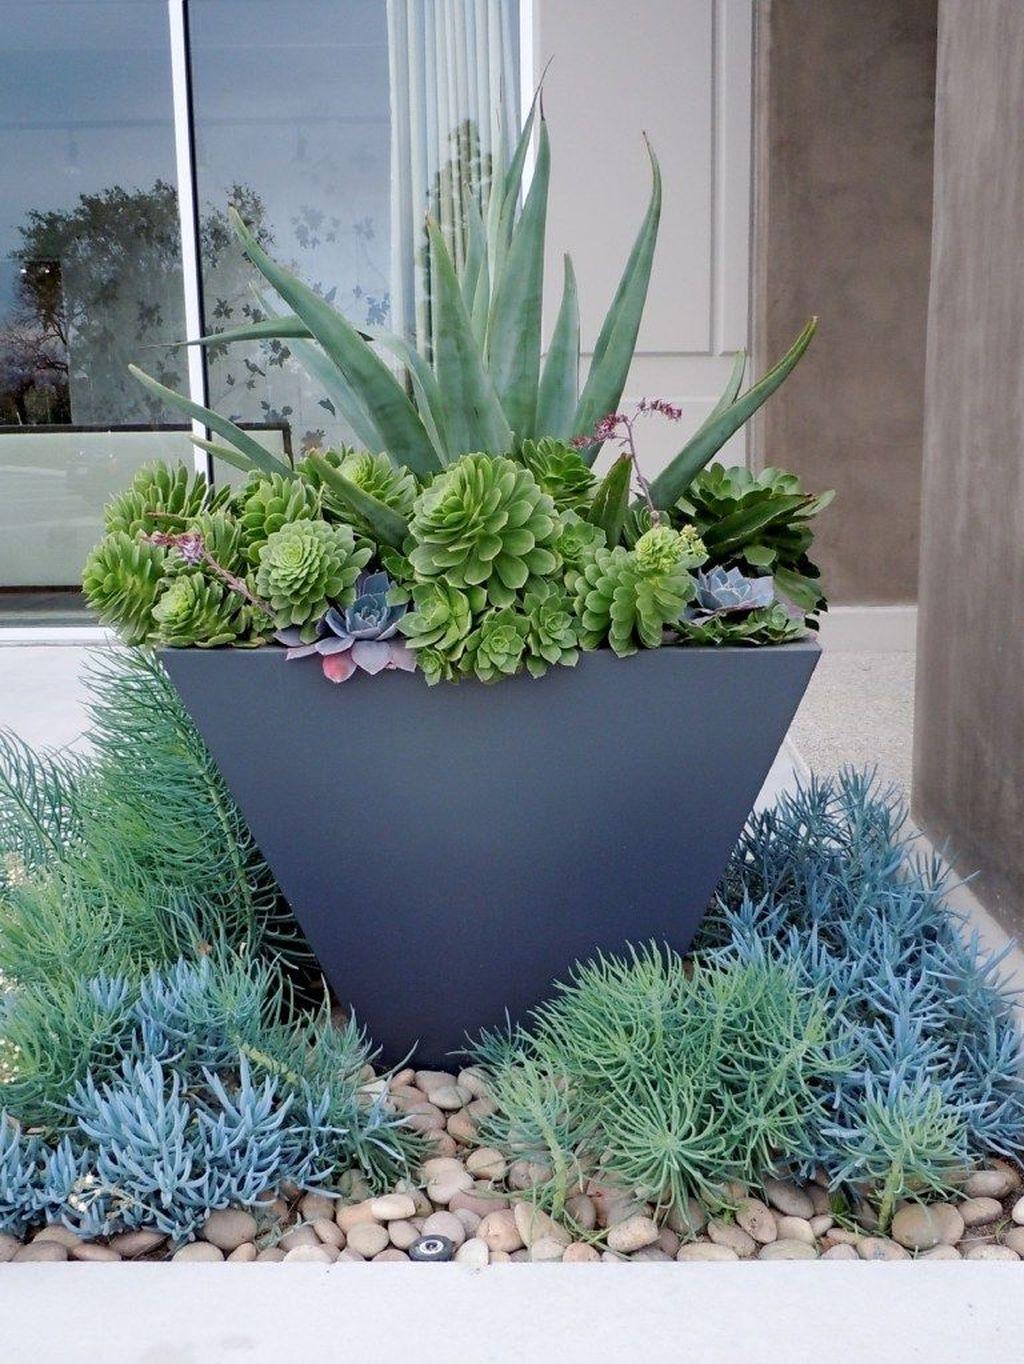 Incredible Cactus Garden Landscaping Ideas Best For Summer 25